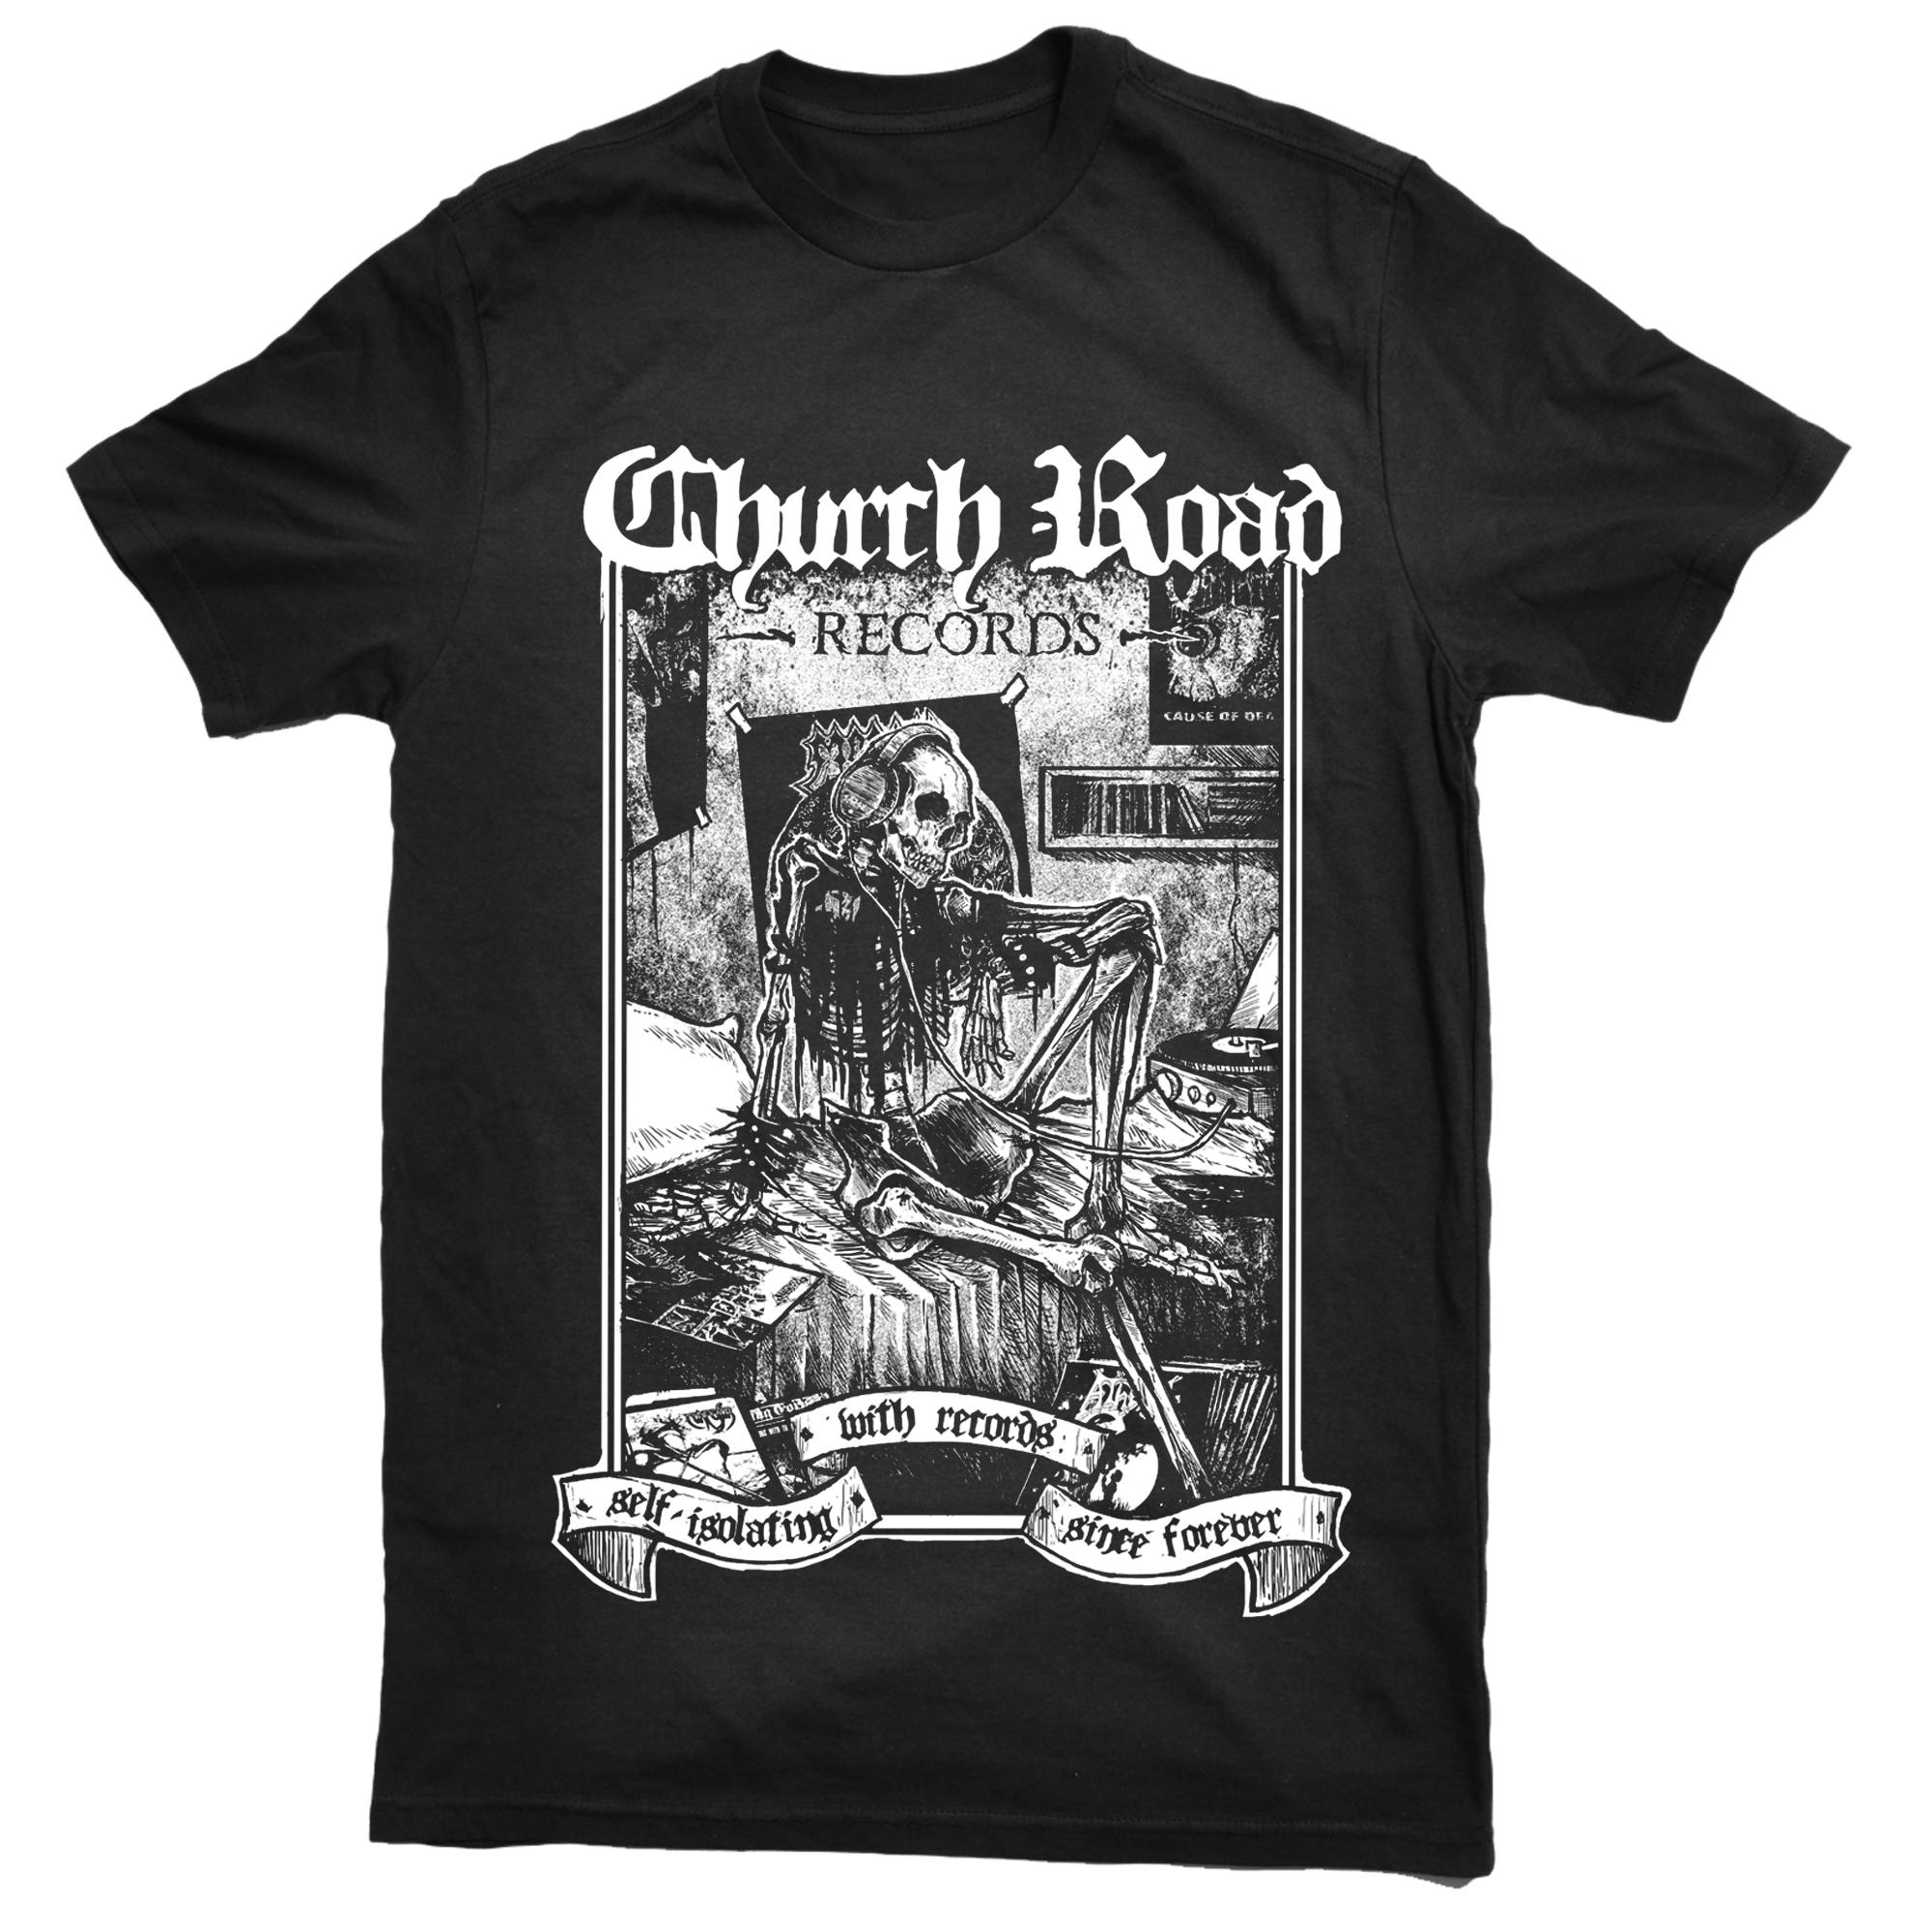 Church Road 'self-isolating' shirt